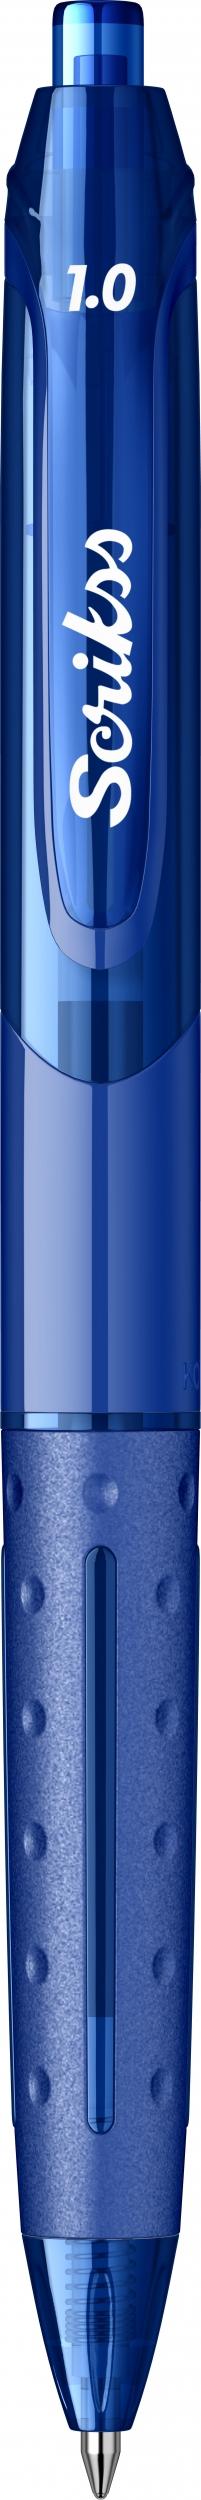 Гел химикалка Scrikss 1.0, модел 53390, Хубрид Синьо